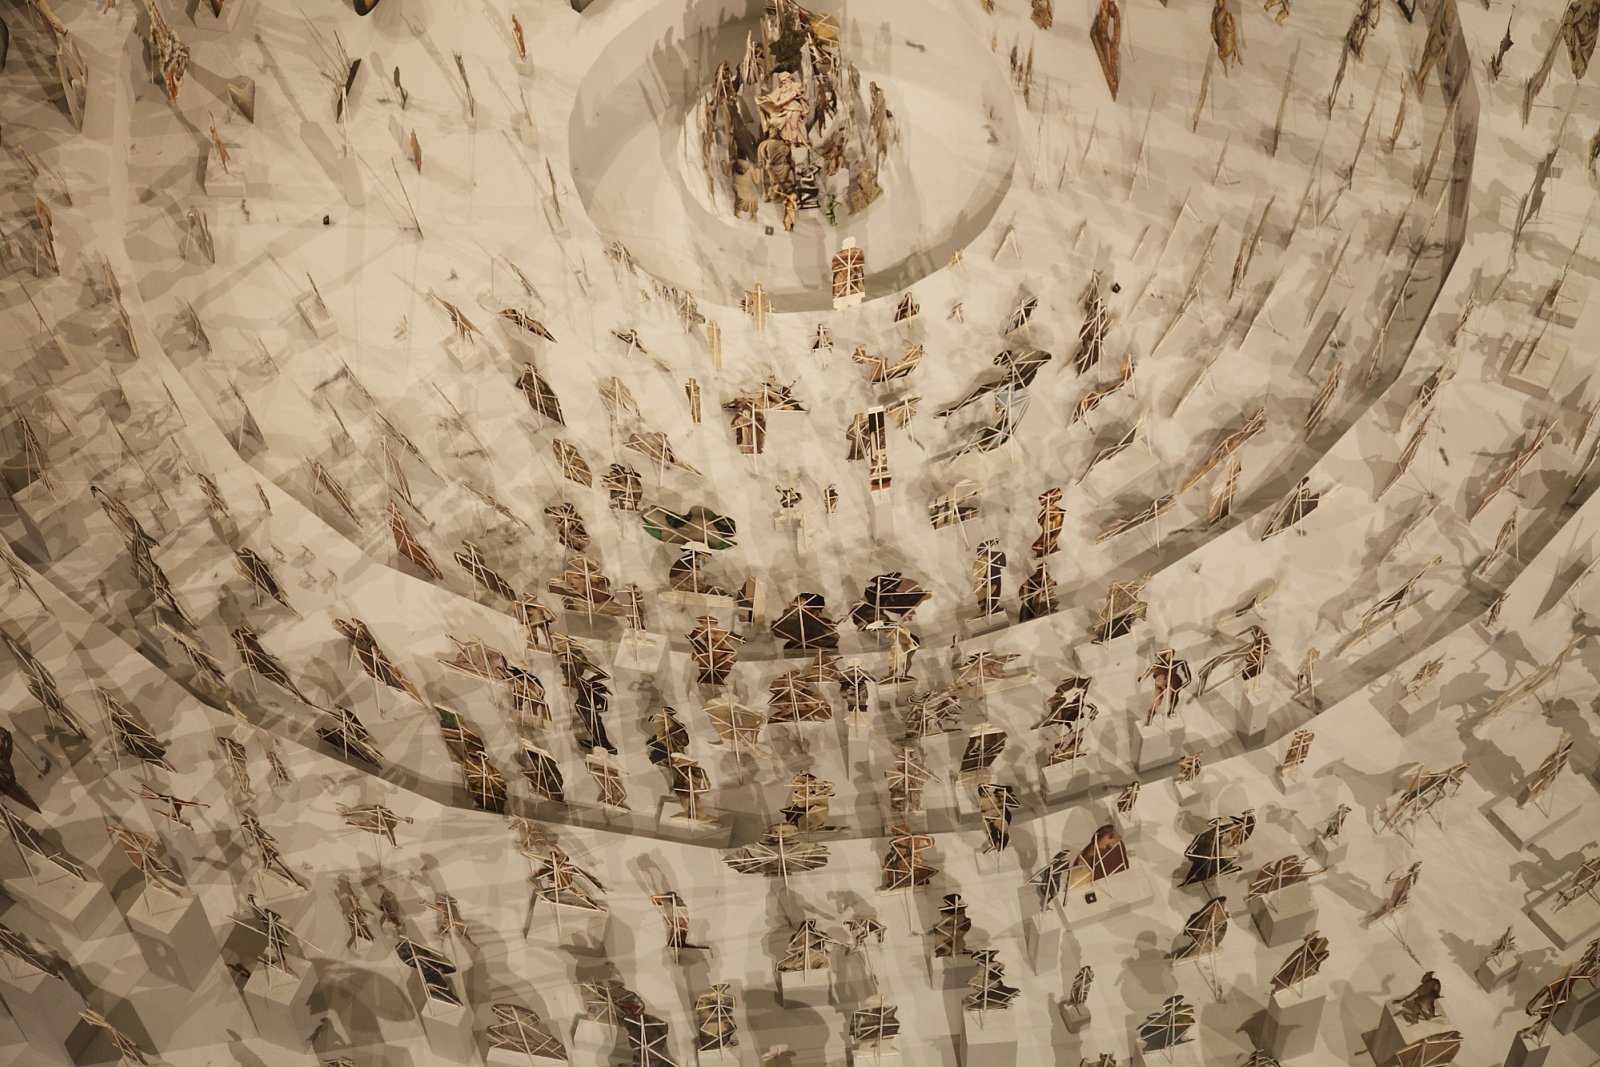 Geoffrey Farmer, Boneyard (detail), 2013, paper cutouts, wood, glue, dimensions variable. Installation view, A Brief History of the Future, Musée du Louvre, Paris, 2015 by Geoffrey Farmer